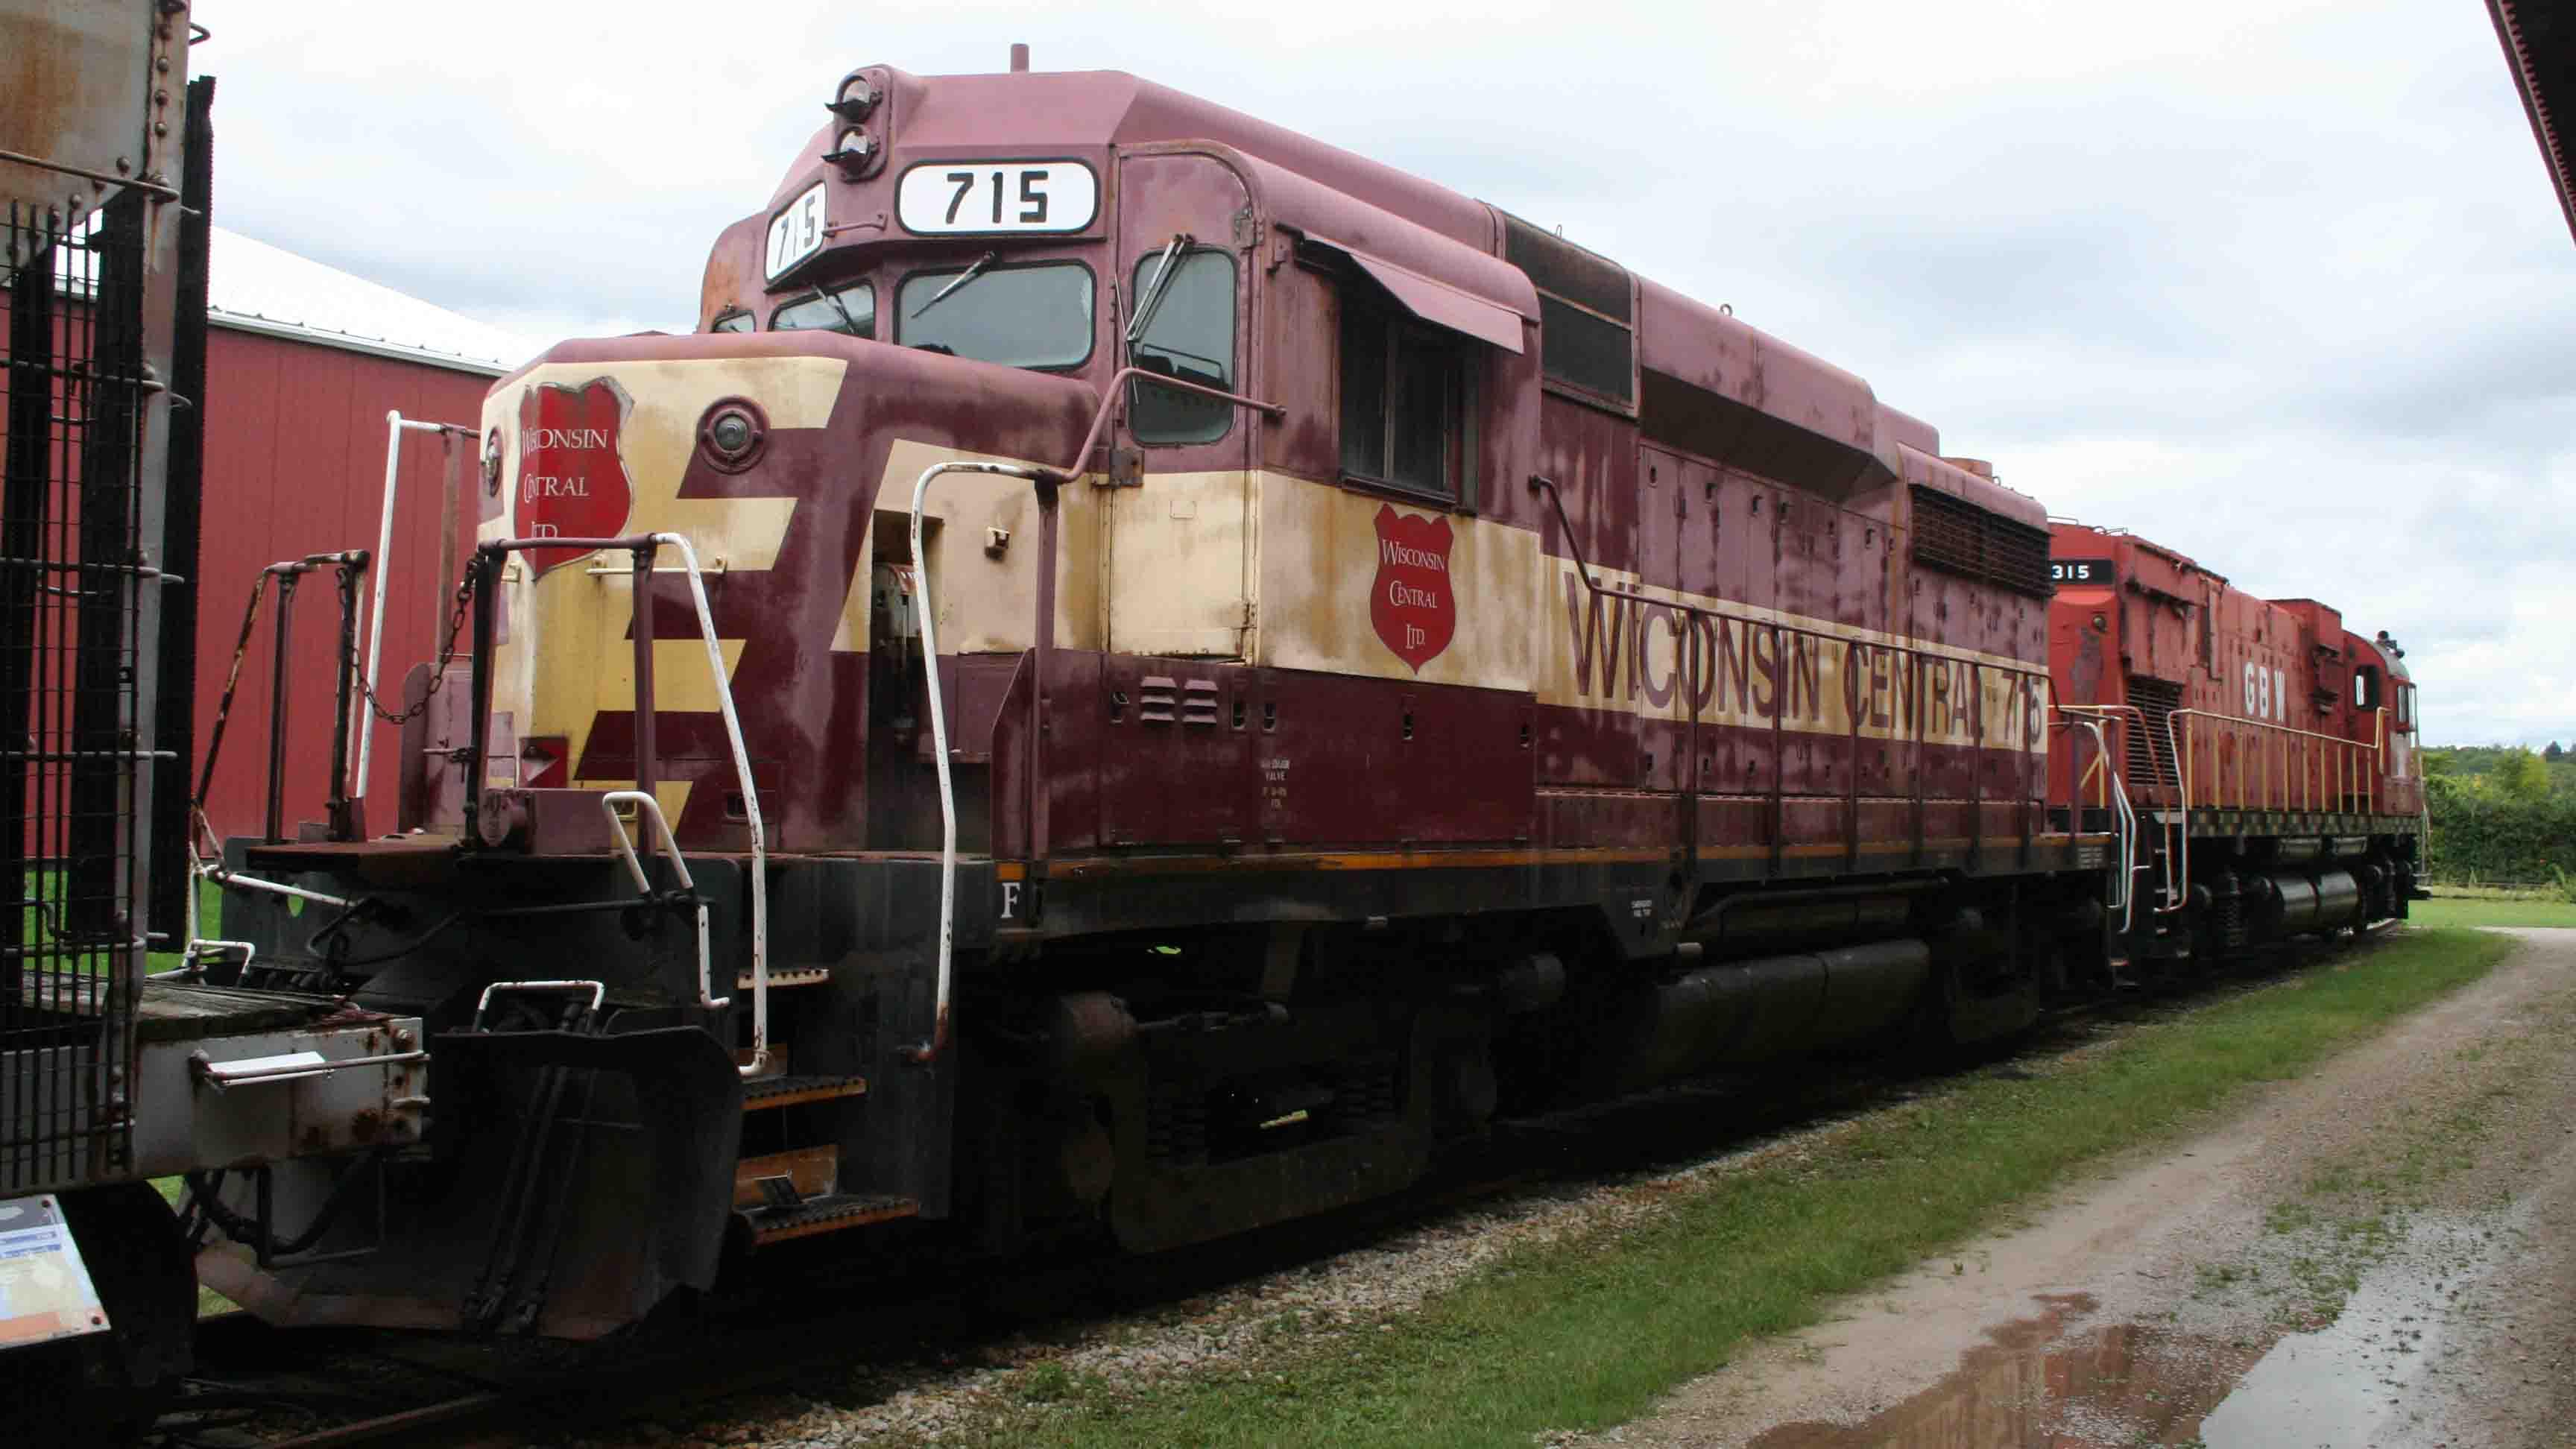 Wisconsin_Central_GP30_Ltd_No_715